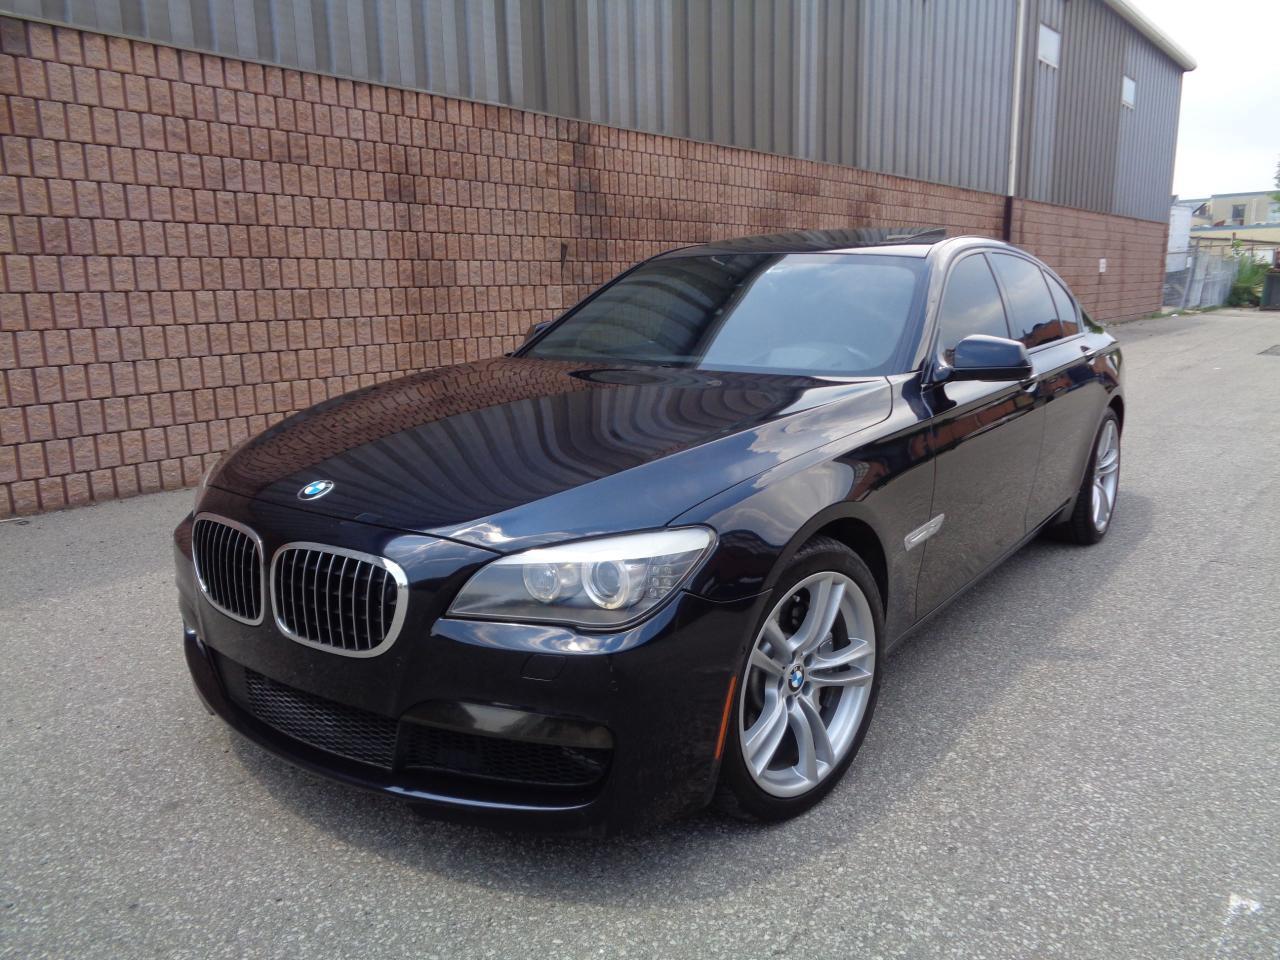 Photo of Carbon Black 2012 BMW 750i